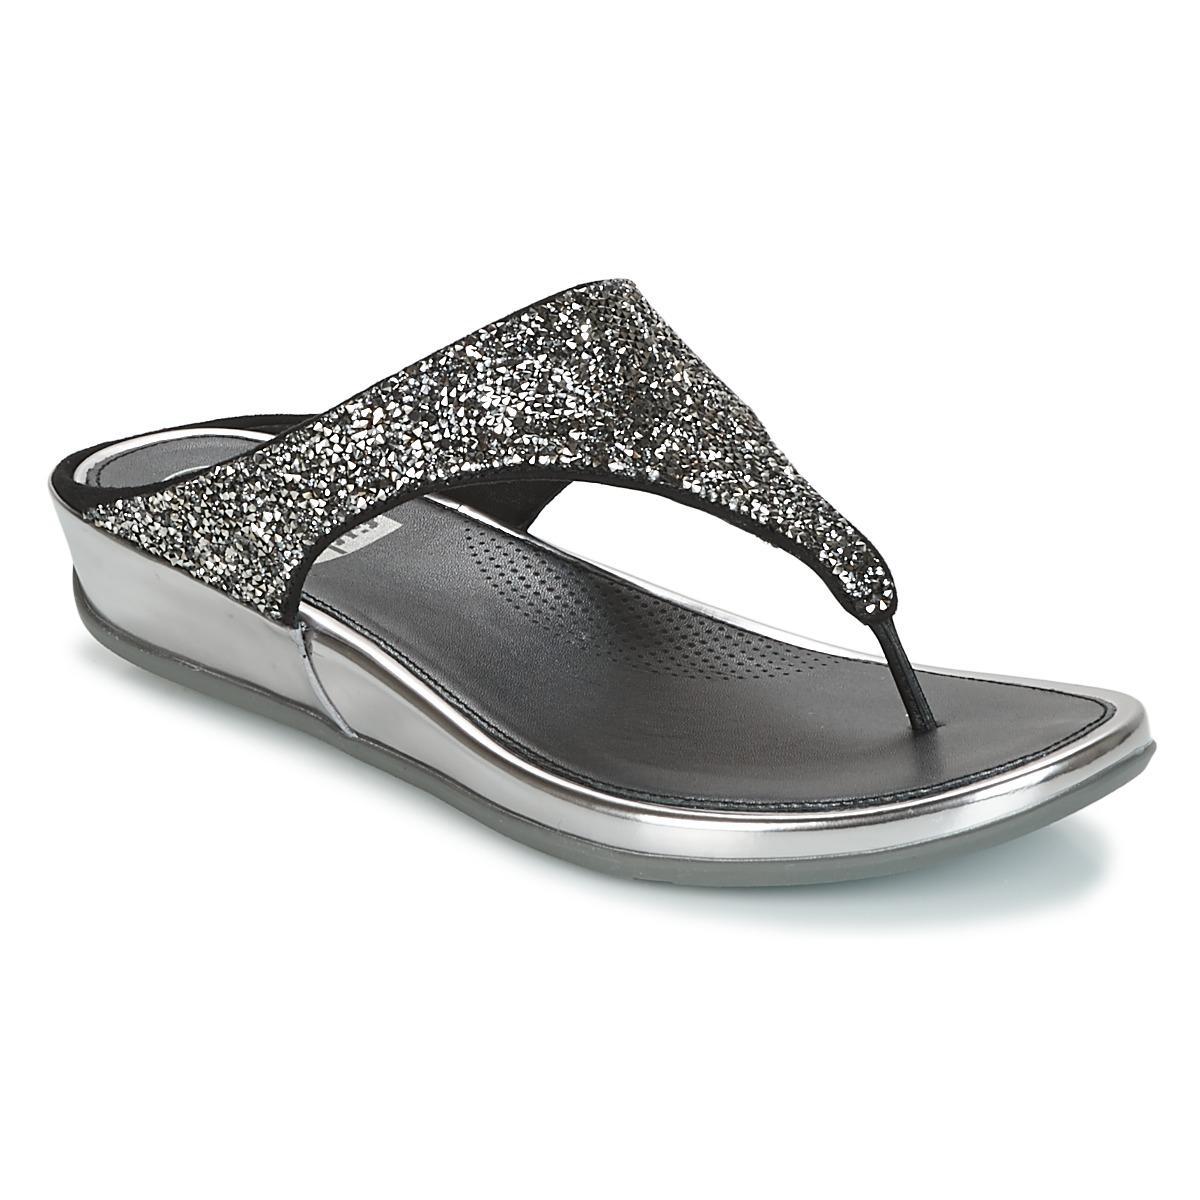 97df018ba Fitflop Banda Crystal Women s Flip Flops   Sandals (shoes) In Silver ...